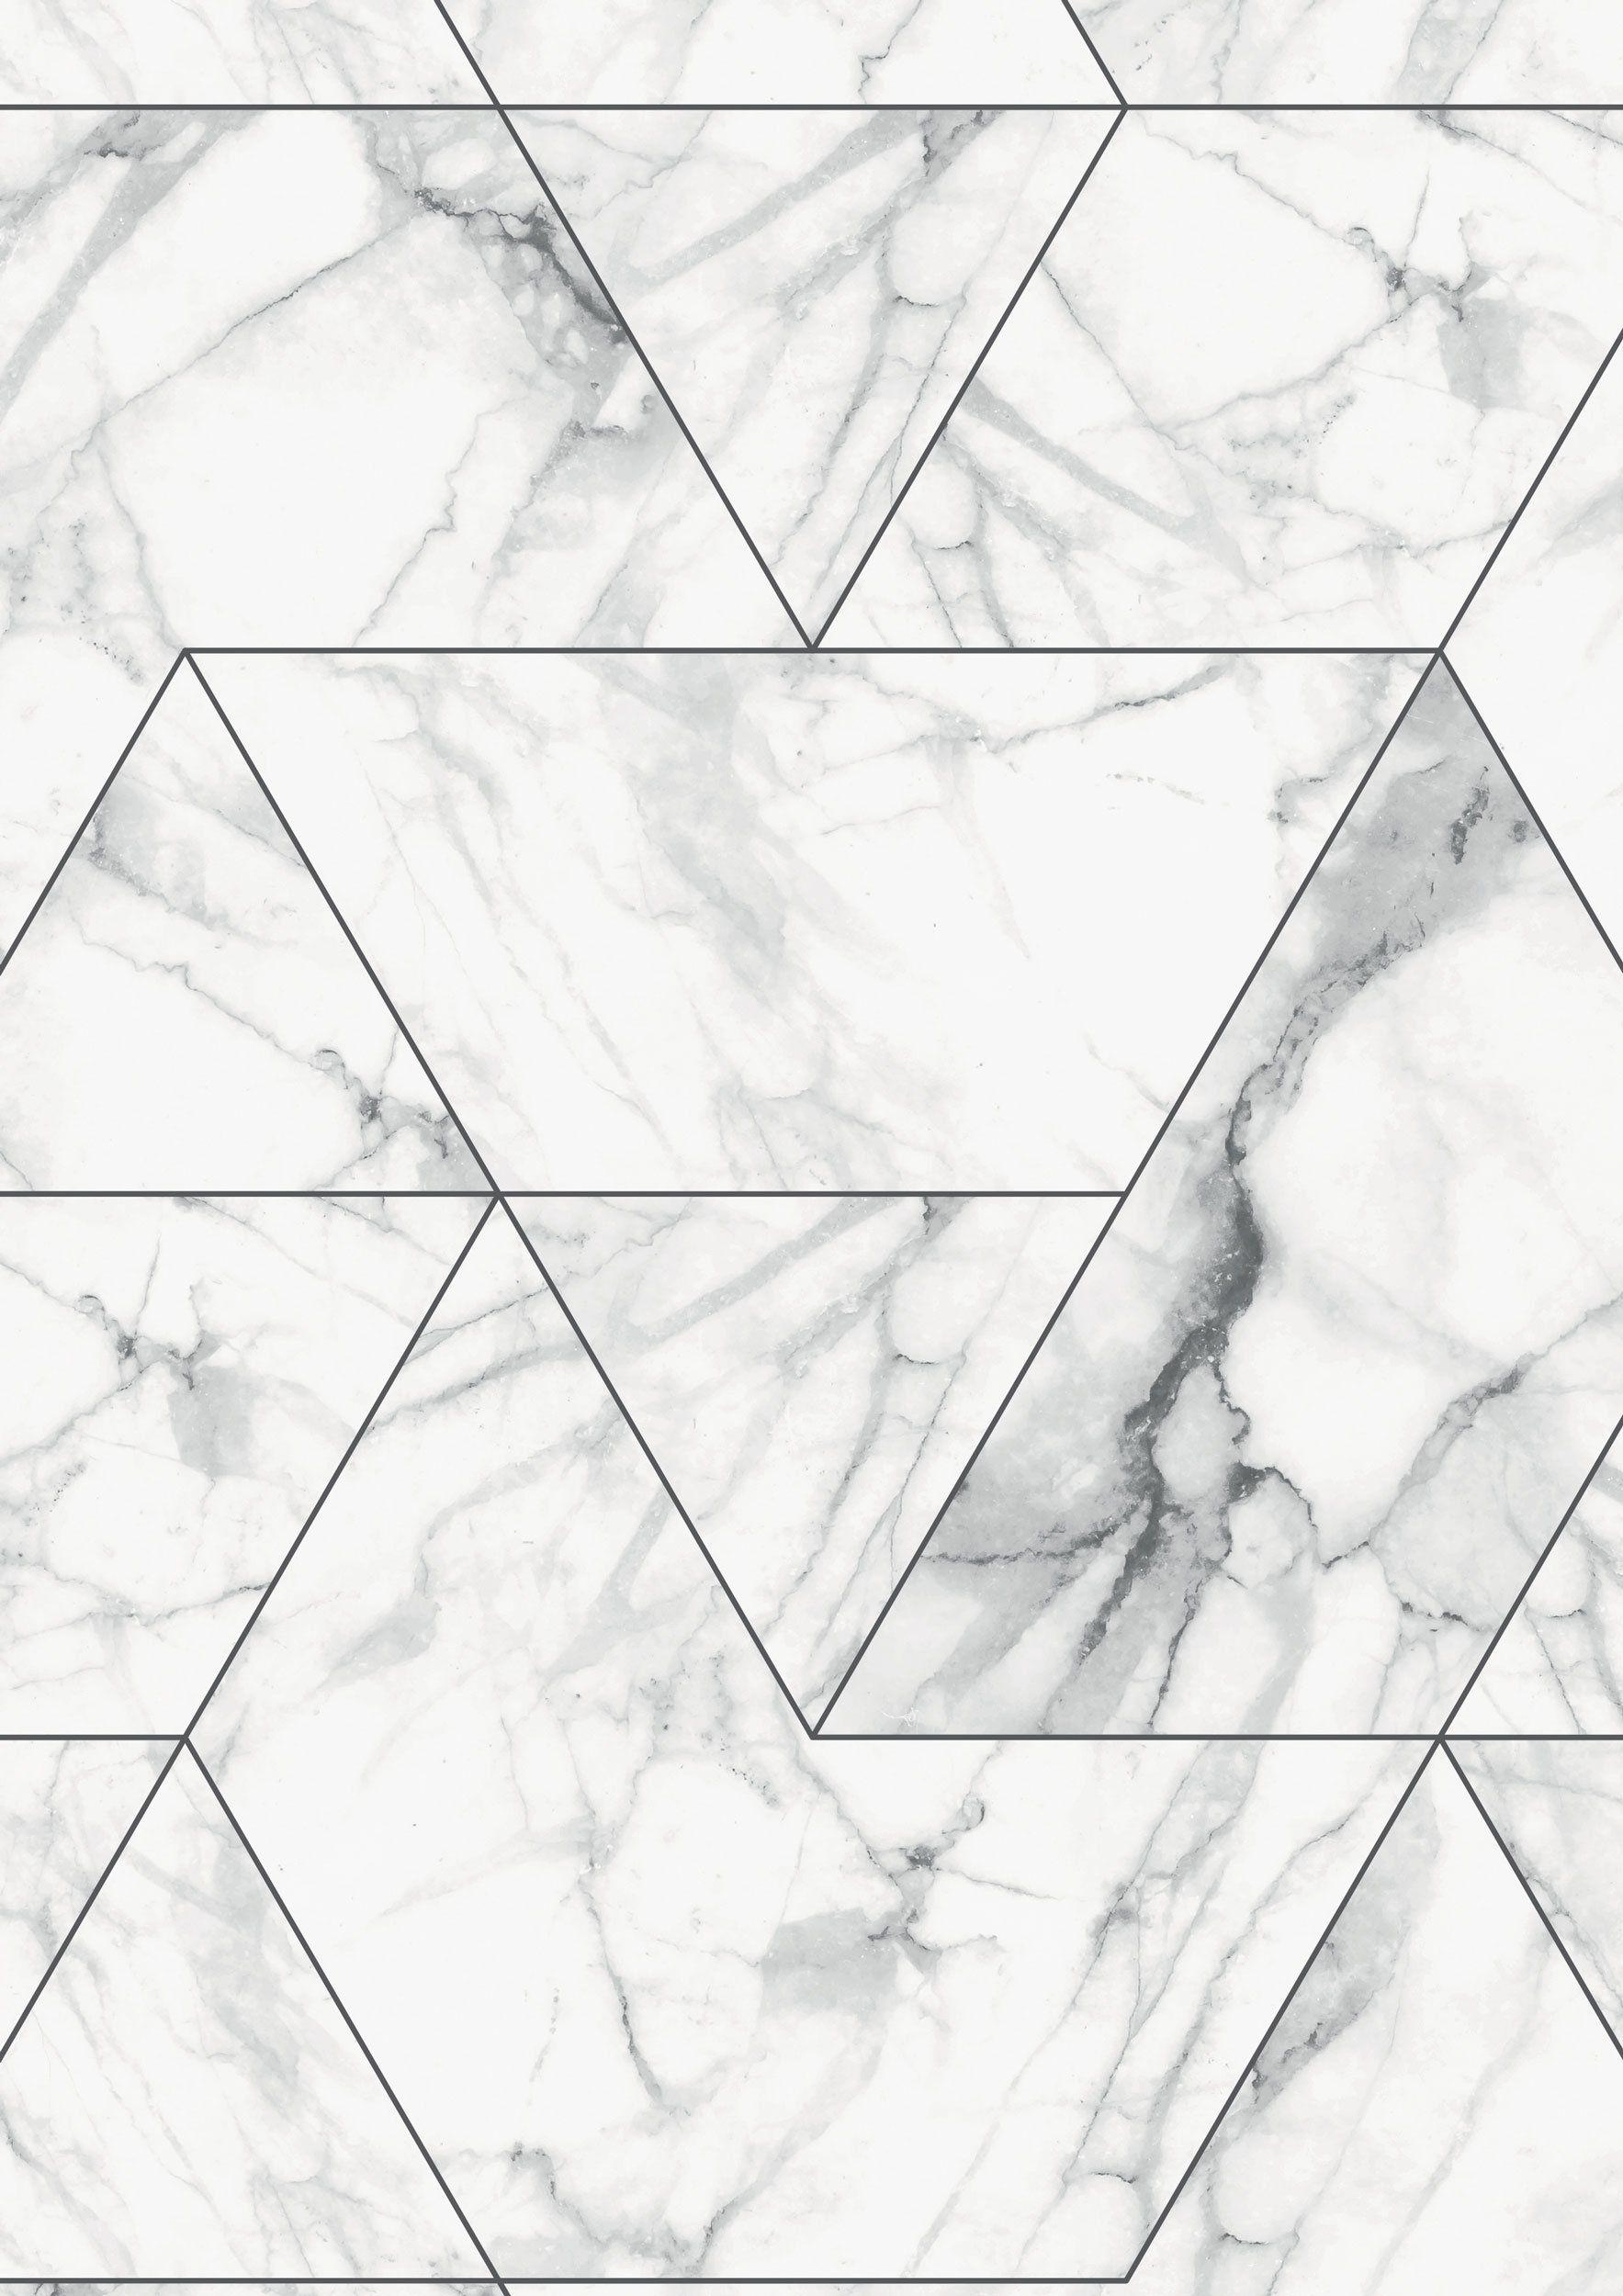 Privilege Colored Porcelain Wall Tiles Achtergronden Bakstenen Muur Witte Bakstenen